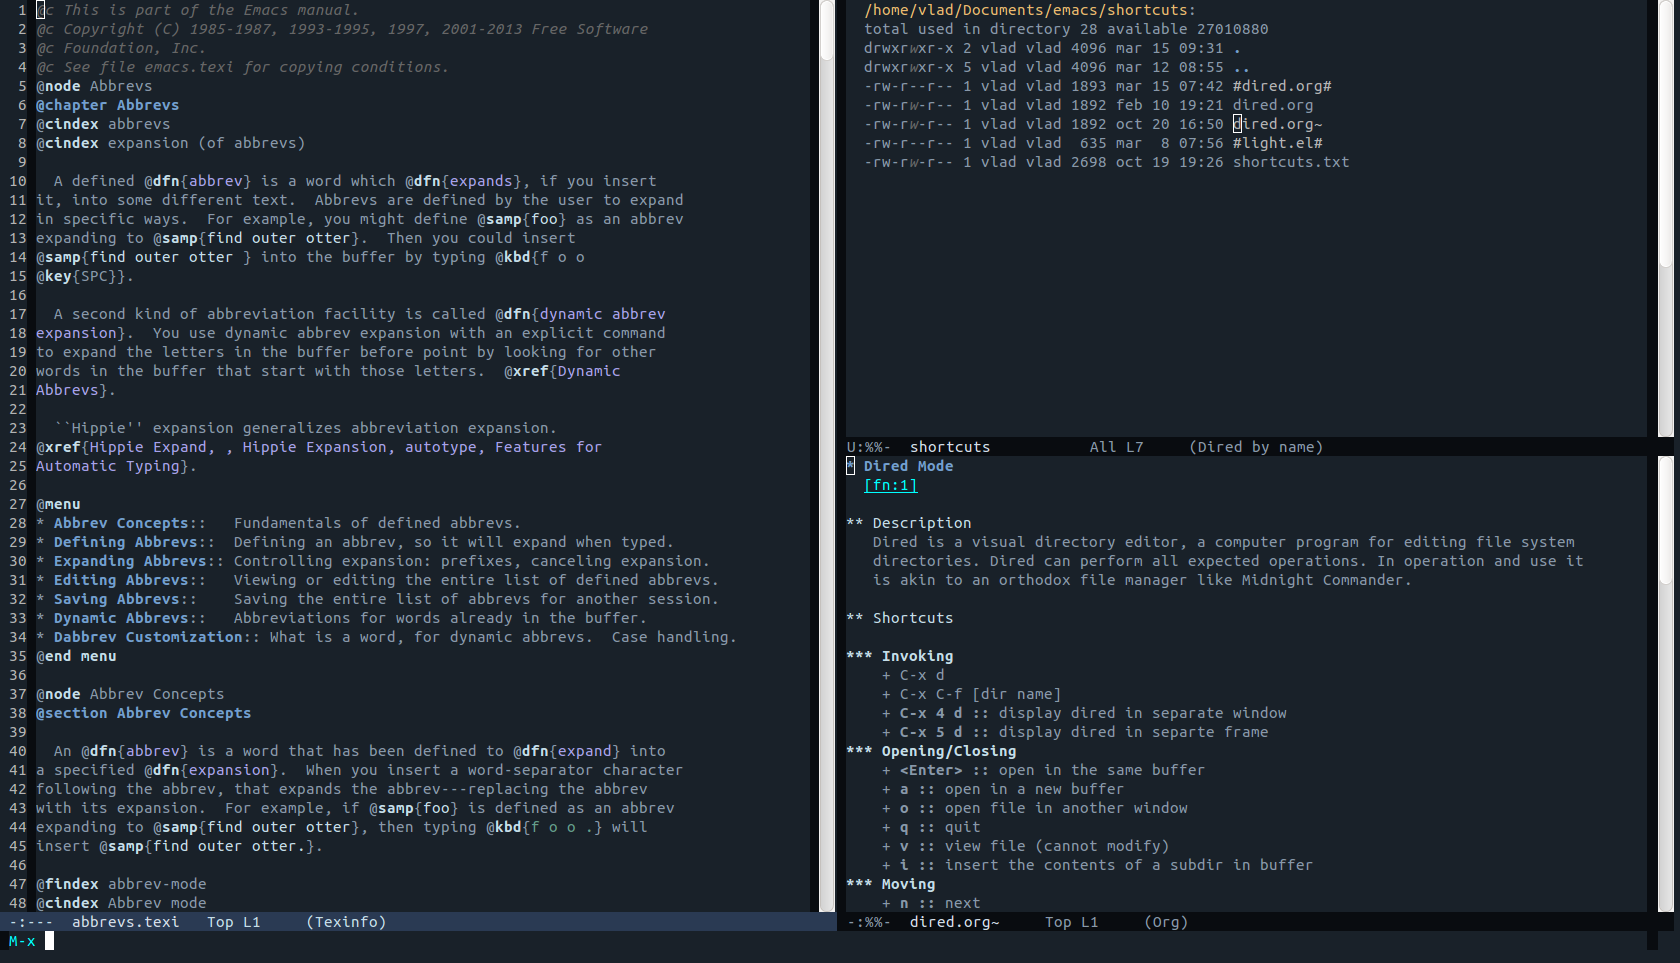 Themes cho gmail - Emacs Screenshot Emacs Screenshot